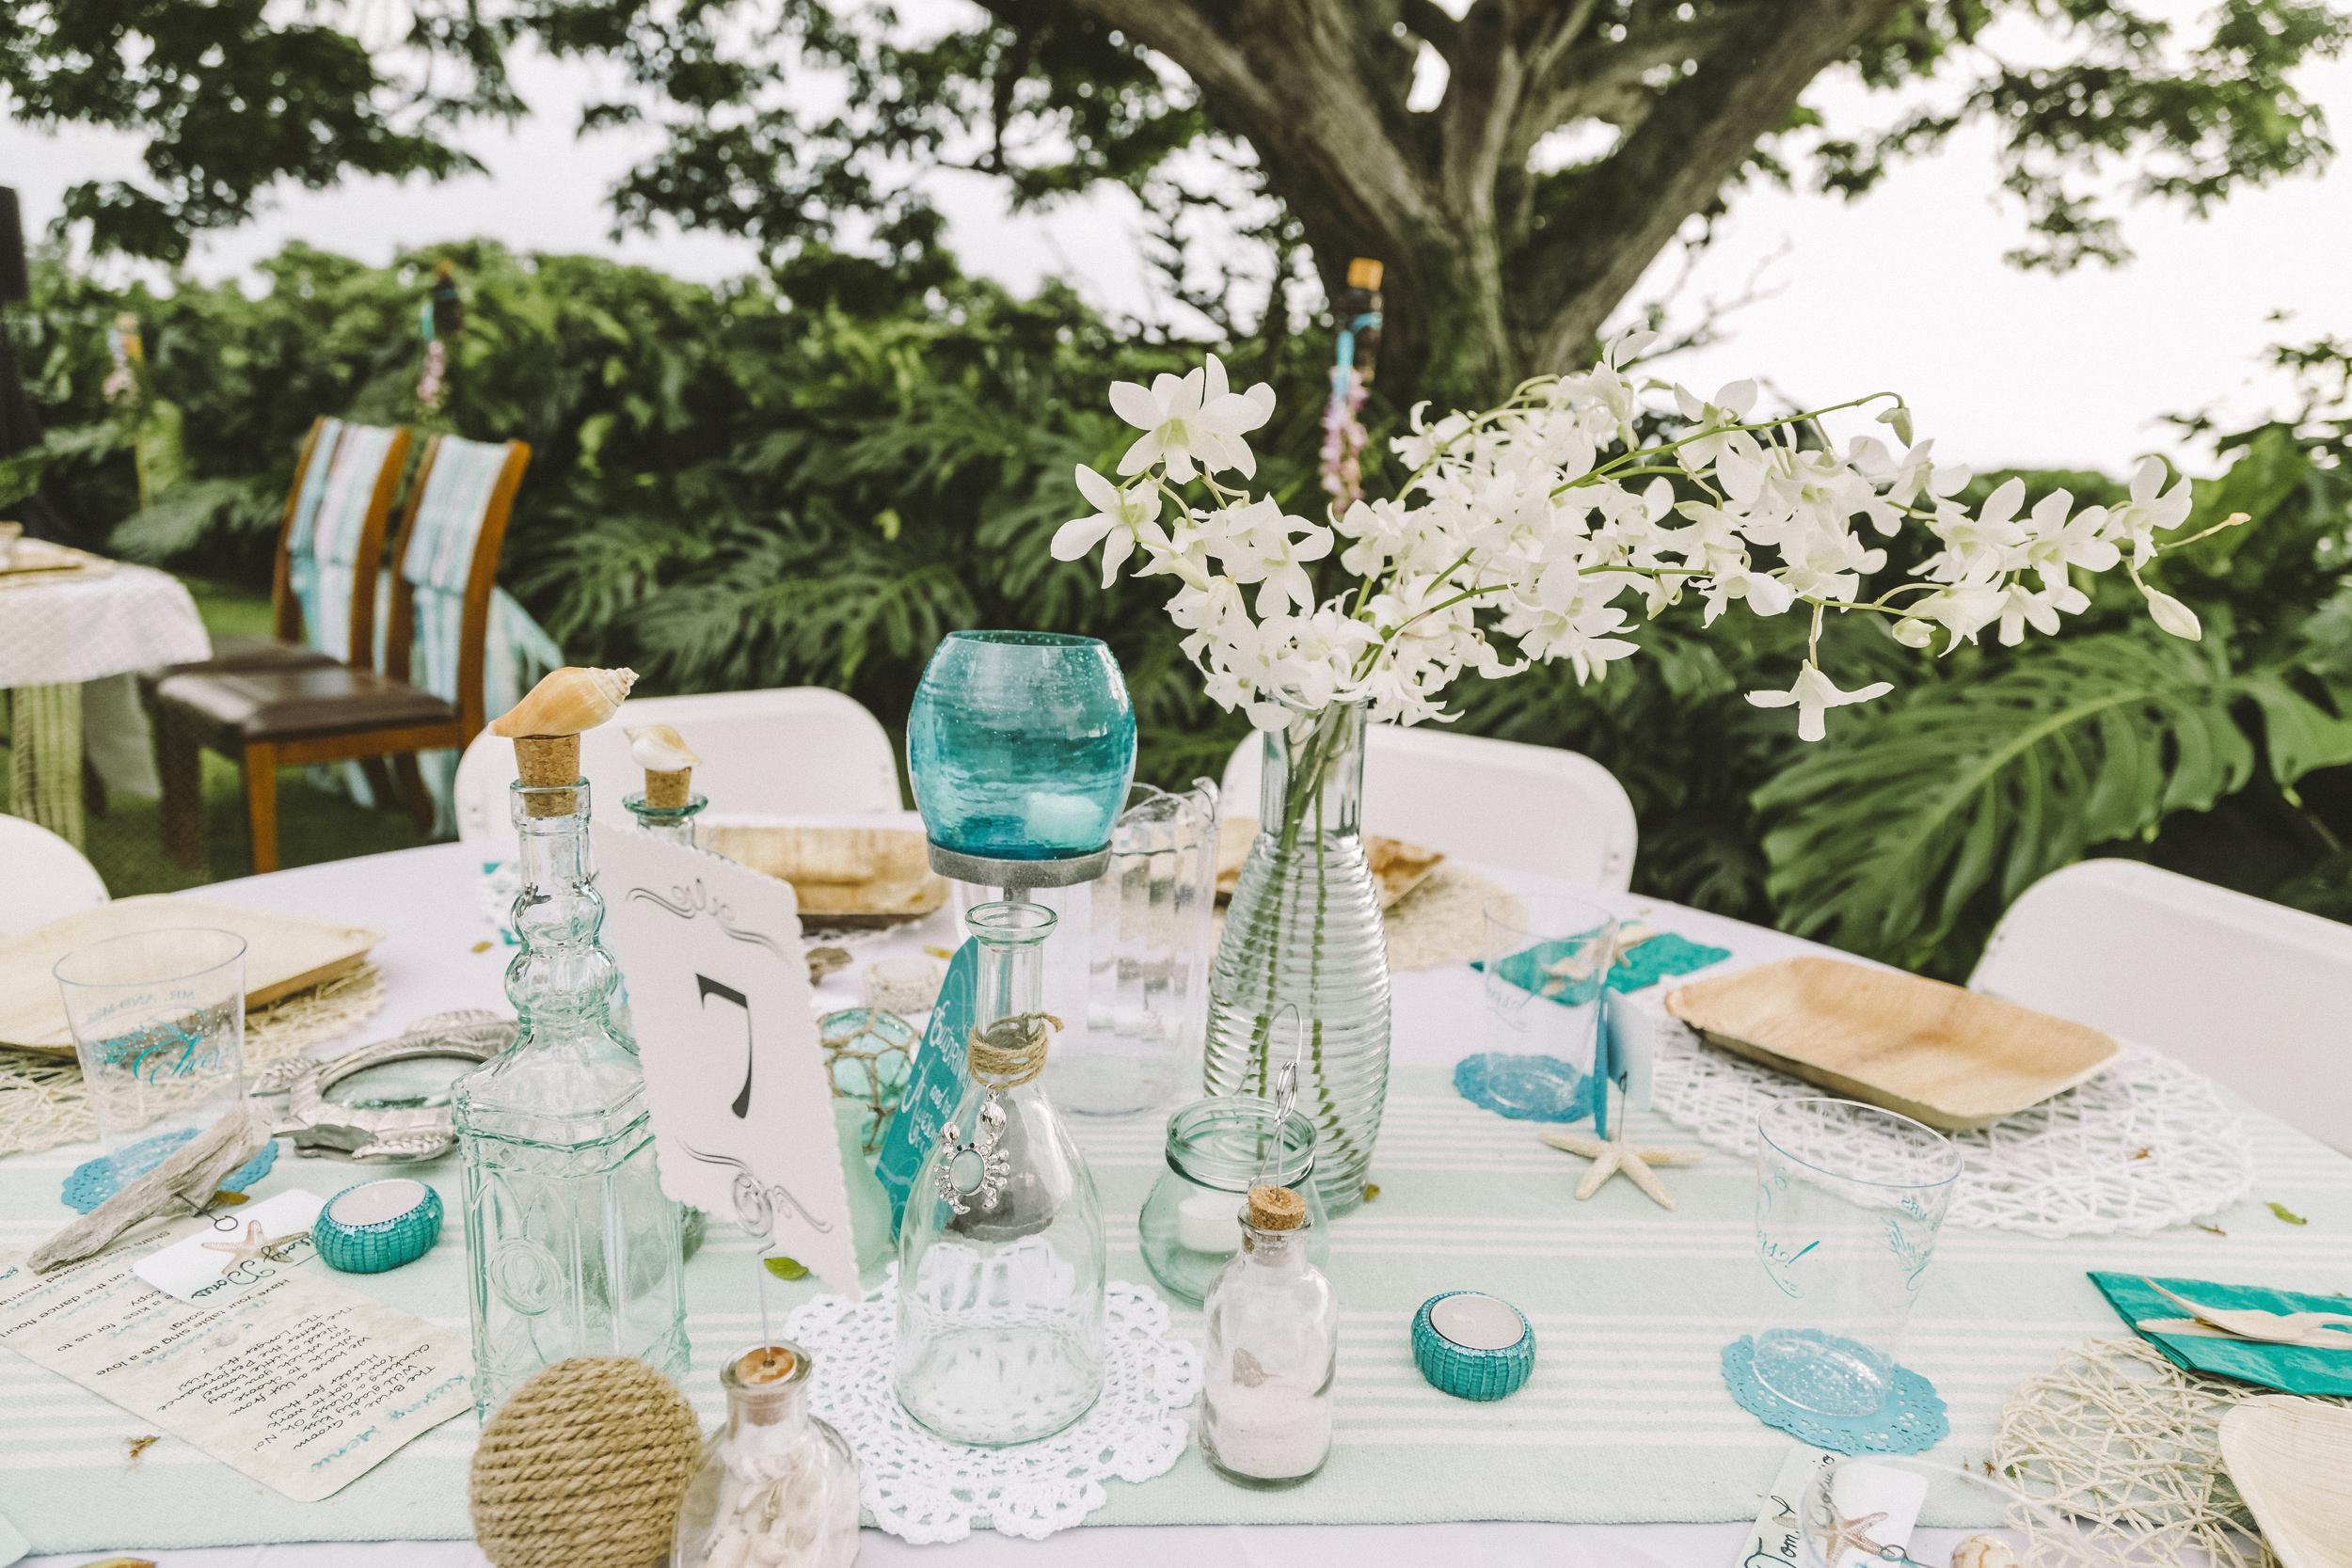 angie-diaz-photography-hawaii-wedding-photographer-kelli-jay-105.jpg